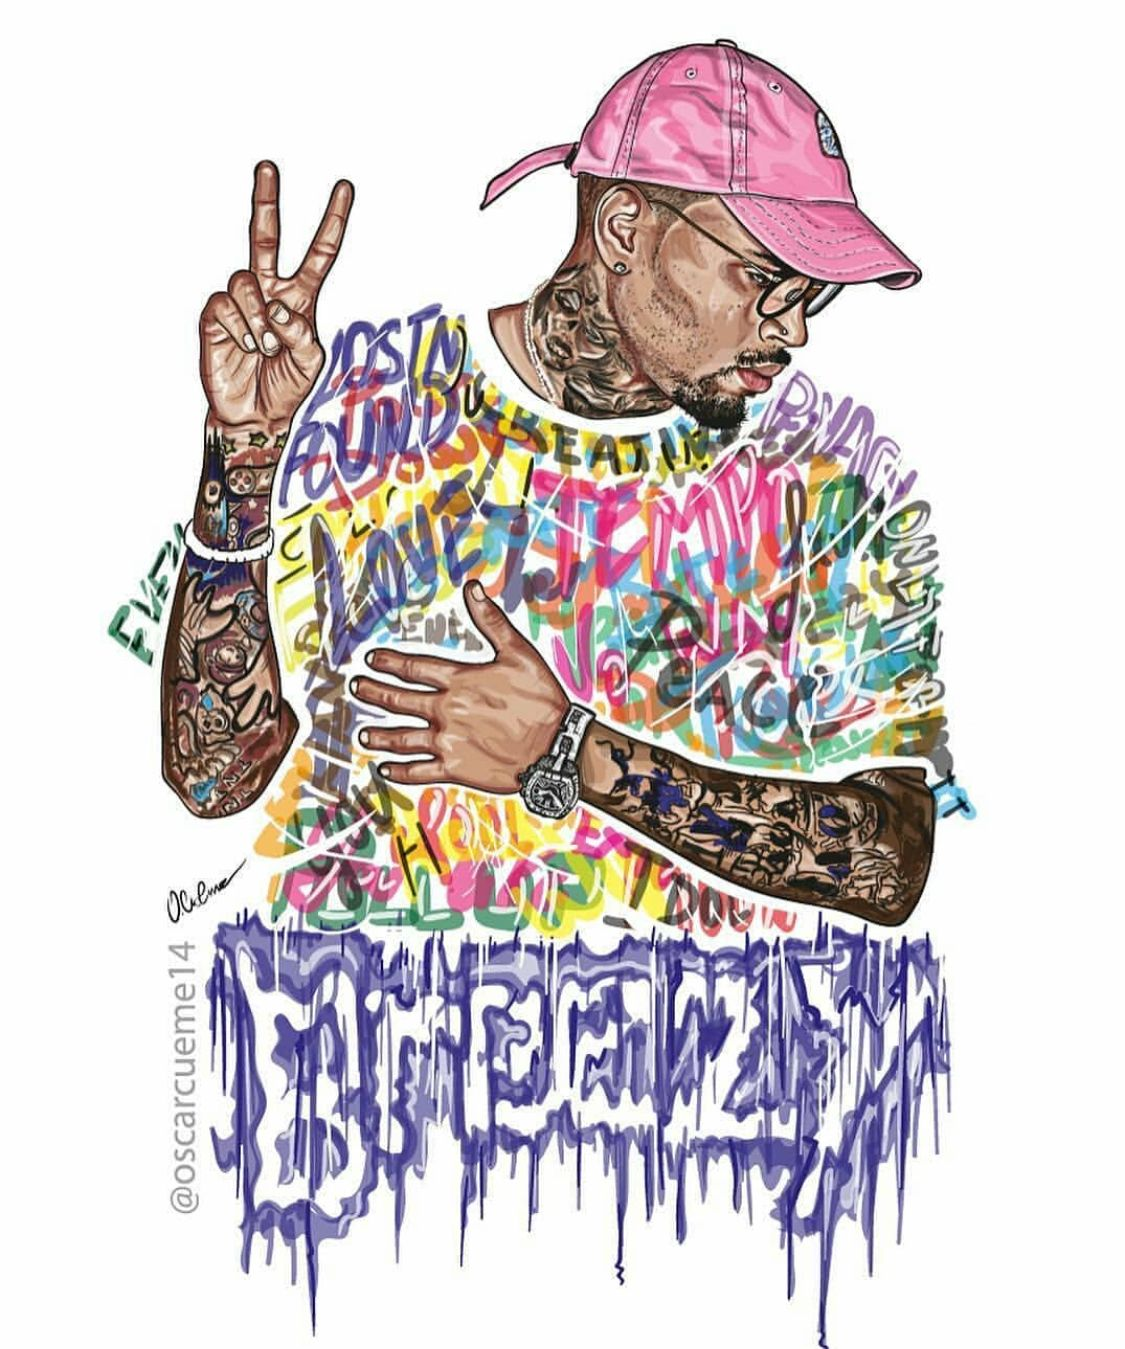 Pin By Makayla Wright On Chris Brown Chris Brown Art Chris Brown Drawing Chris Brown Wallpaper